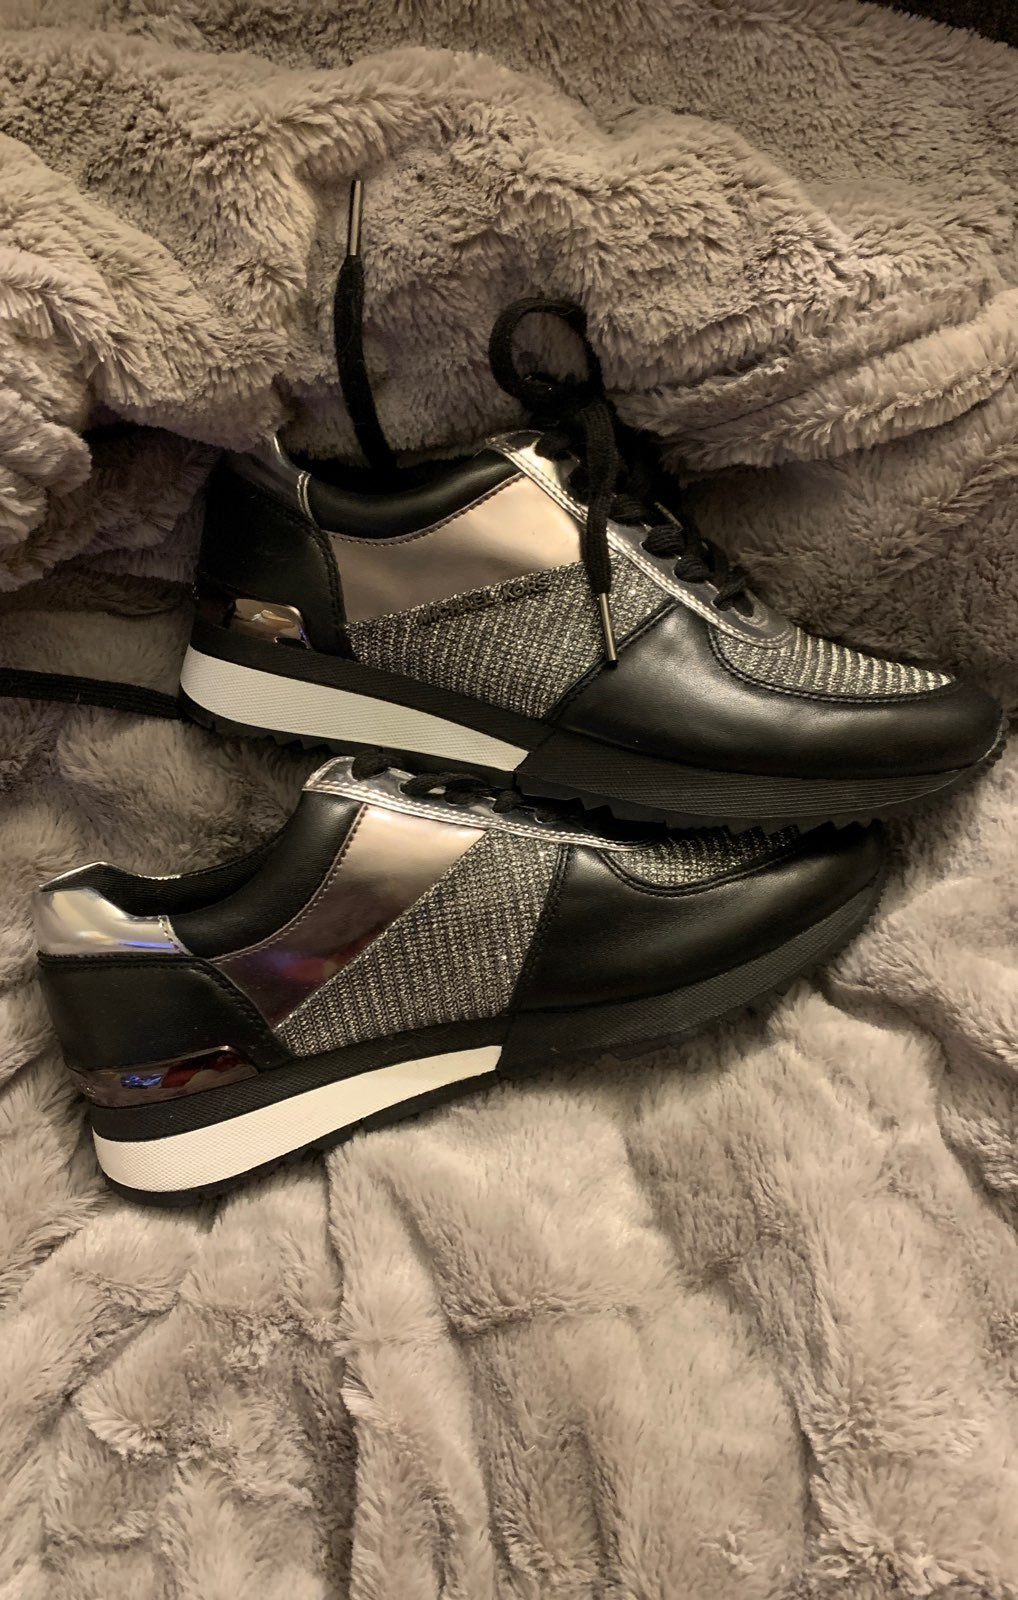 Sz 7.5 Michael Kors Sneakers